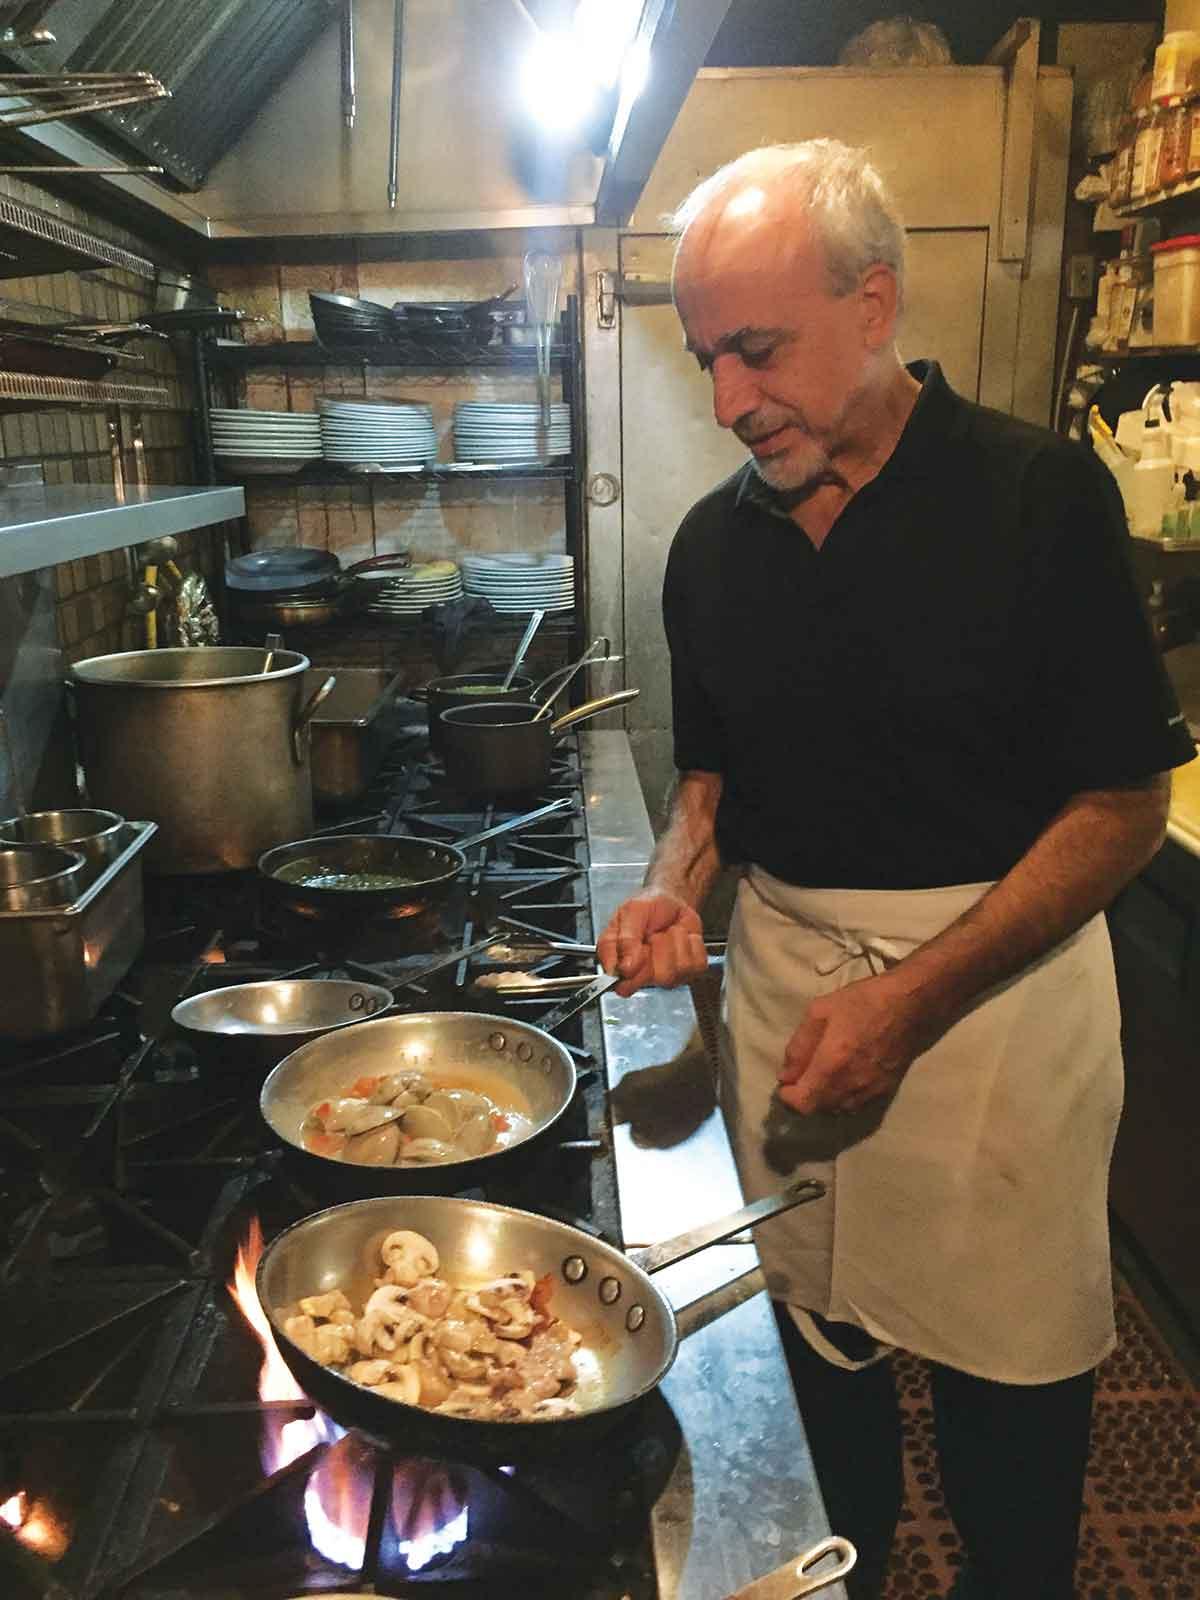 Chef Reza Azeri sautées clams for a dish called vongole. – Kristen Kumakura